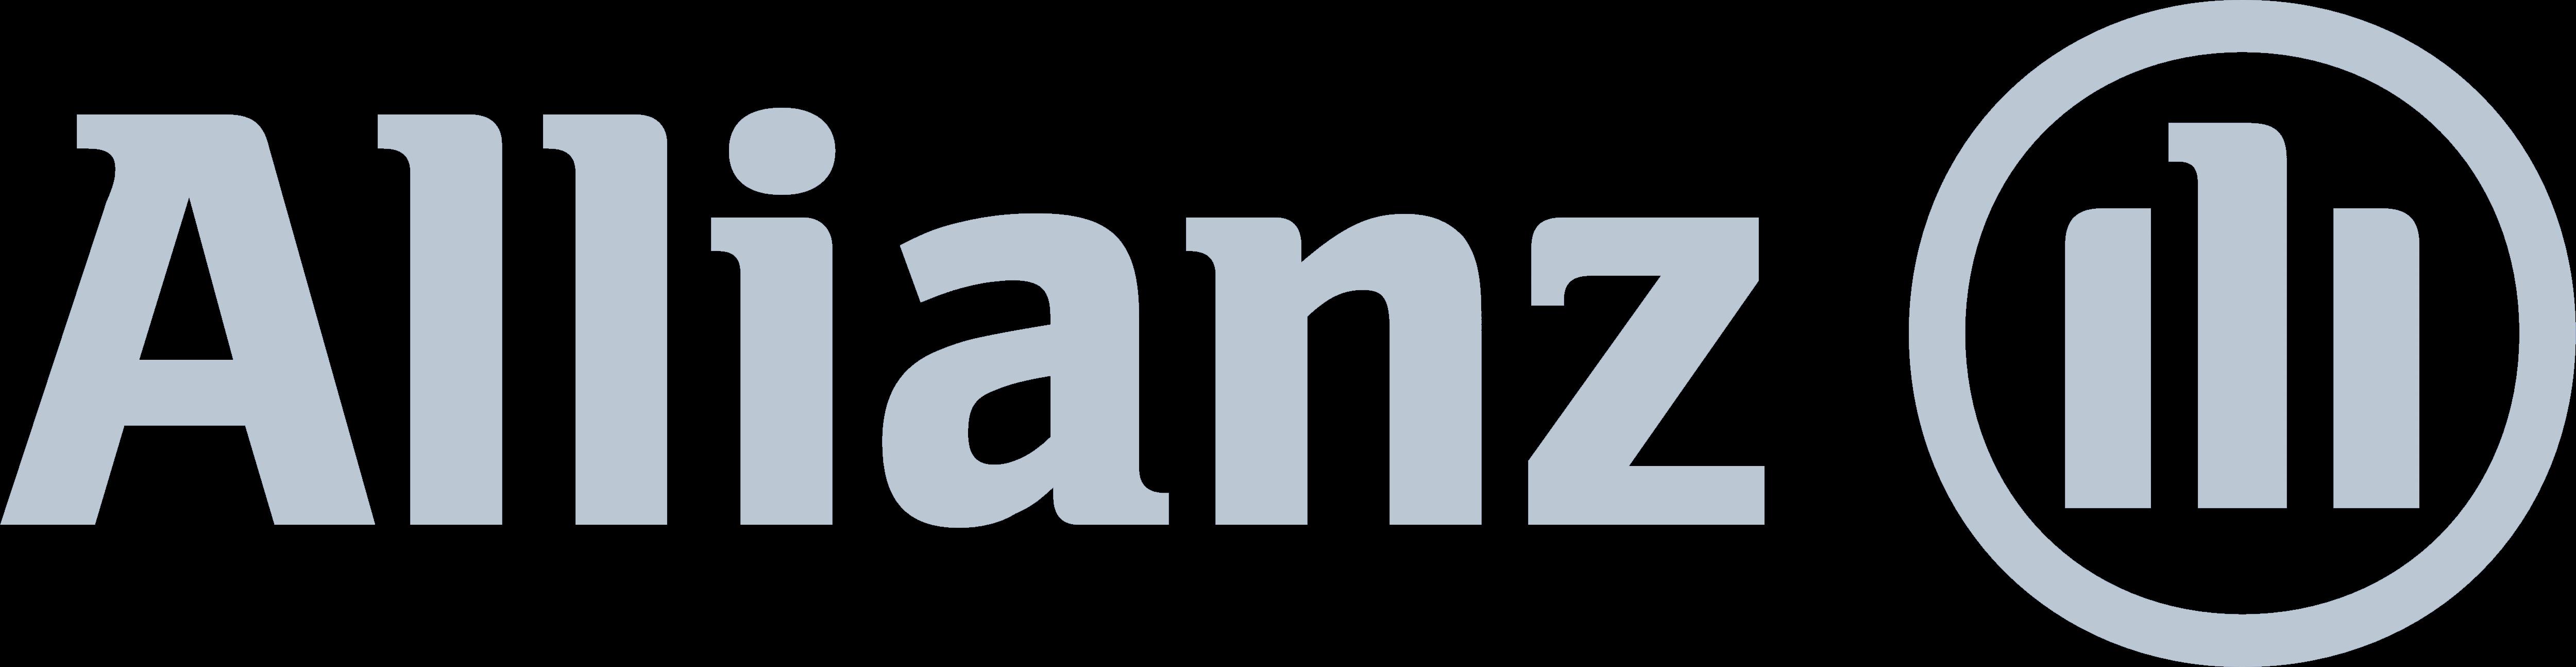 Allianz Benelux